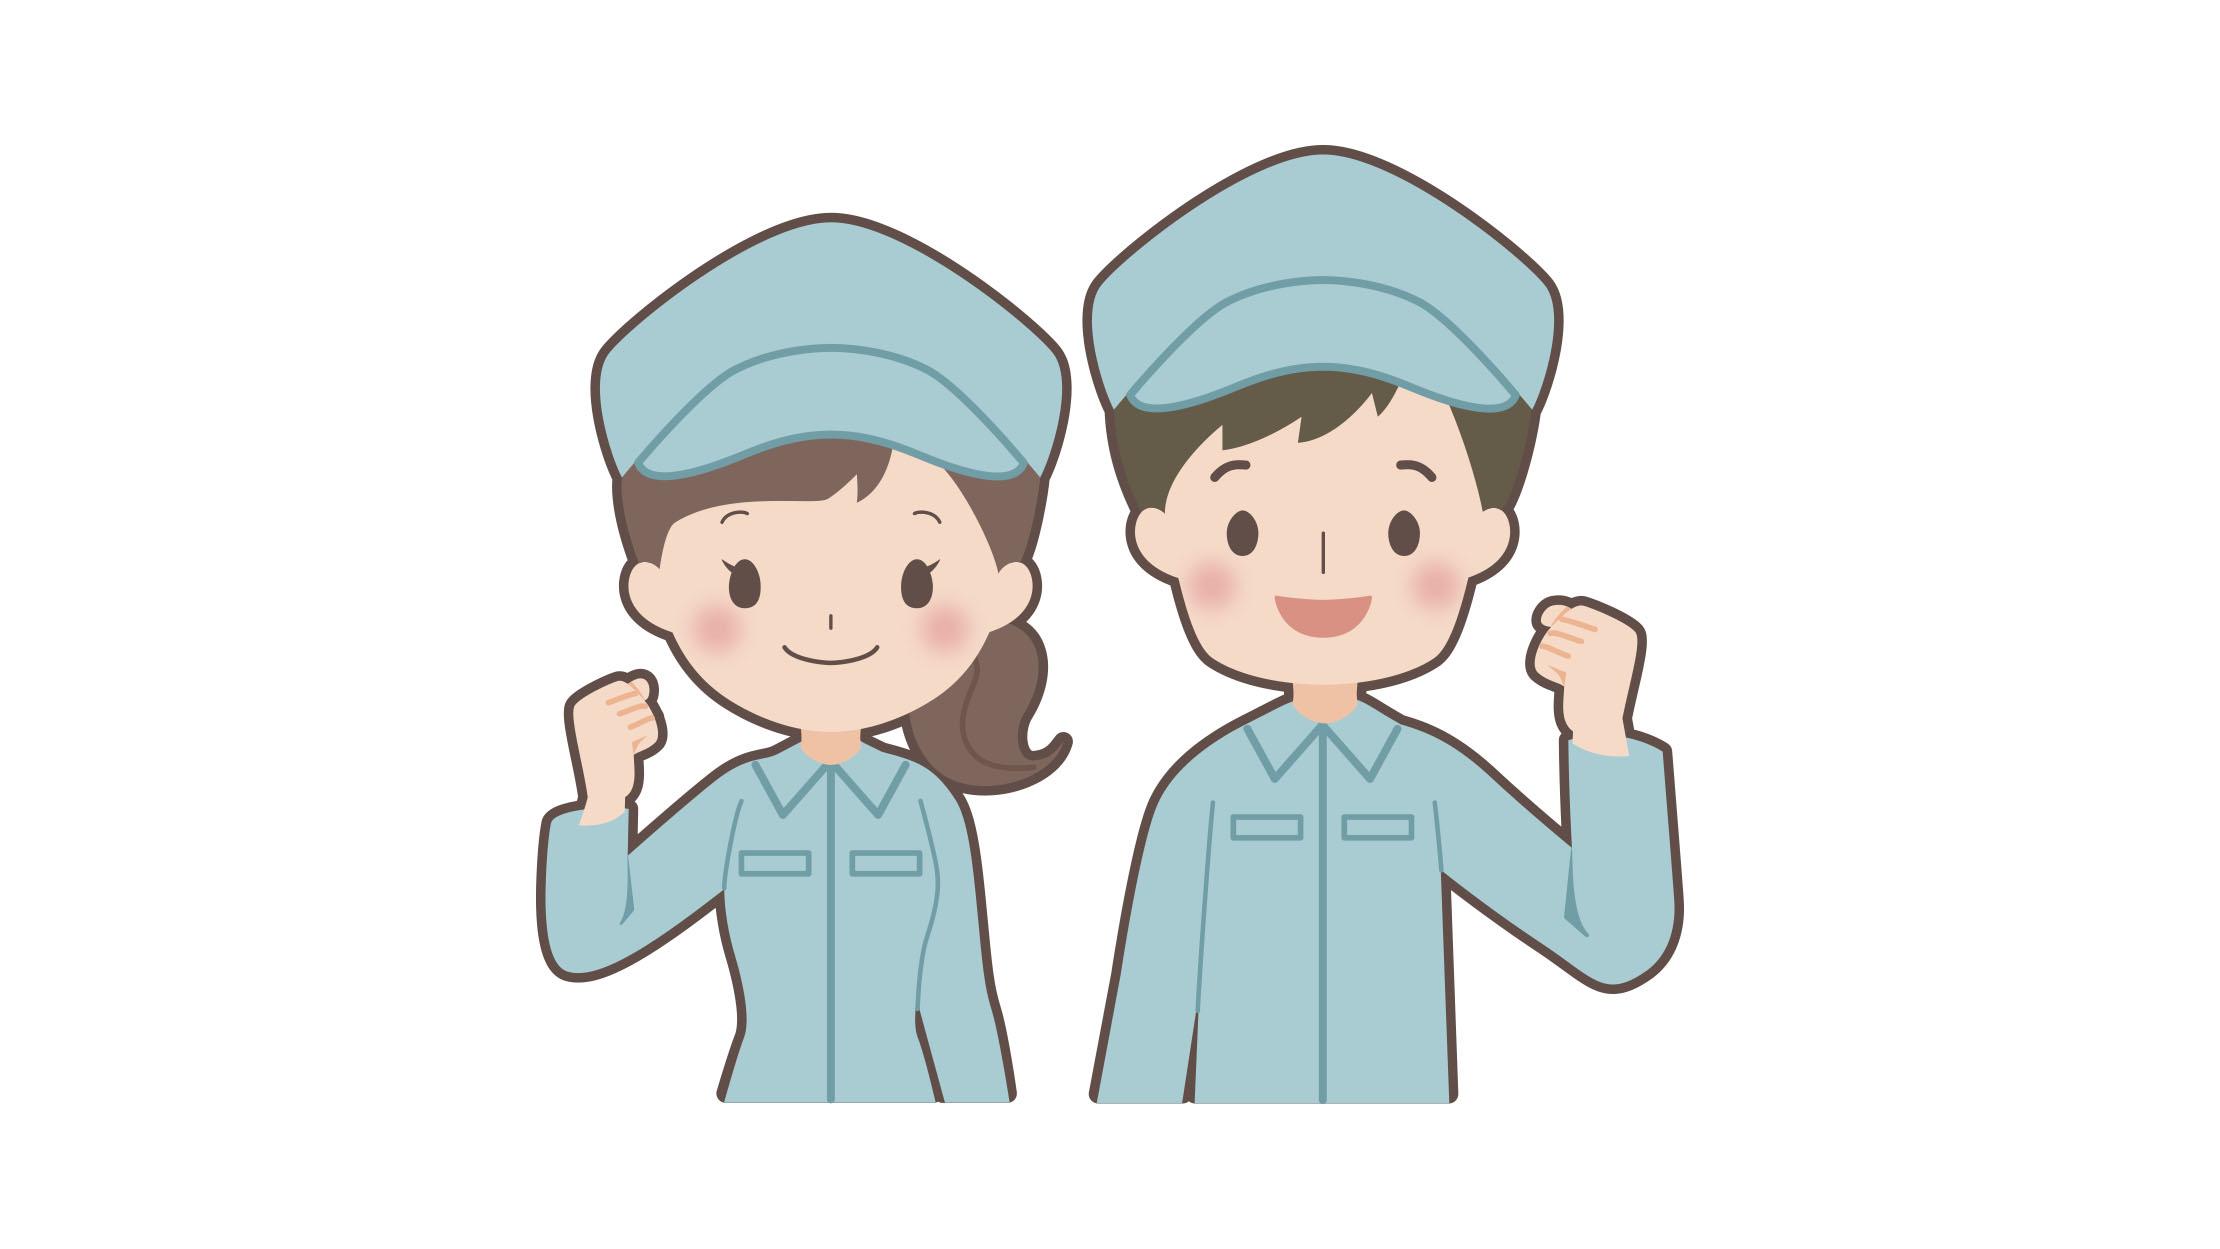 日田中央青果水産㈱ [正]水産部 スタッフ募集